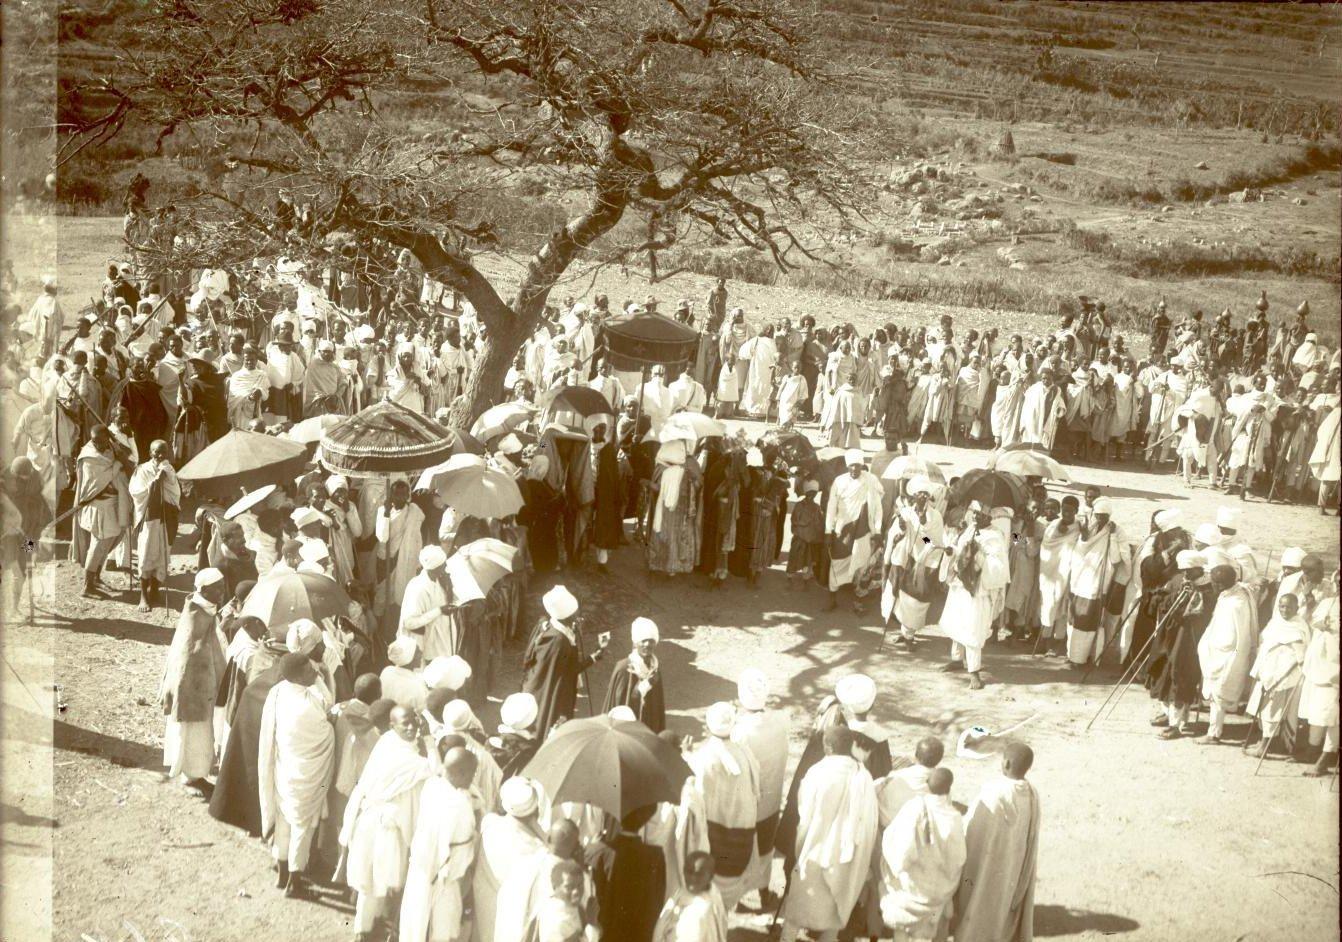 264. Абиссиния, провинция Харар, г. Харар. Крестный ход